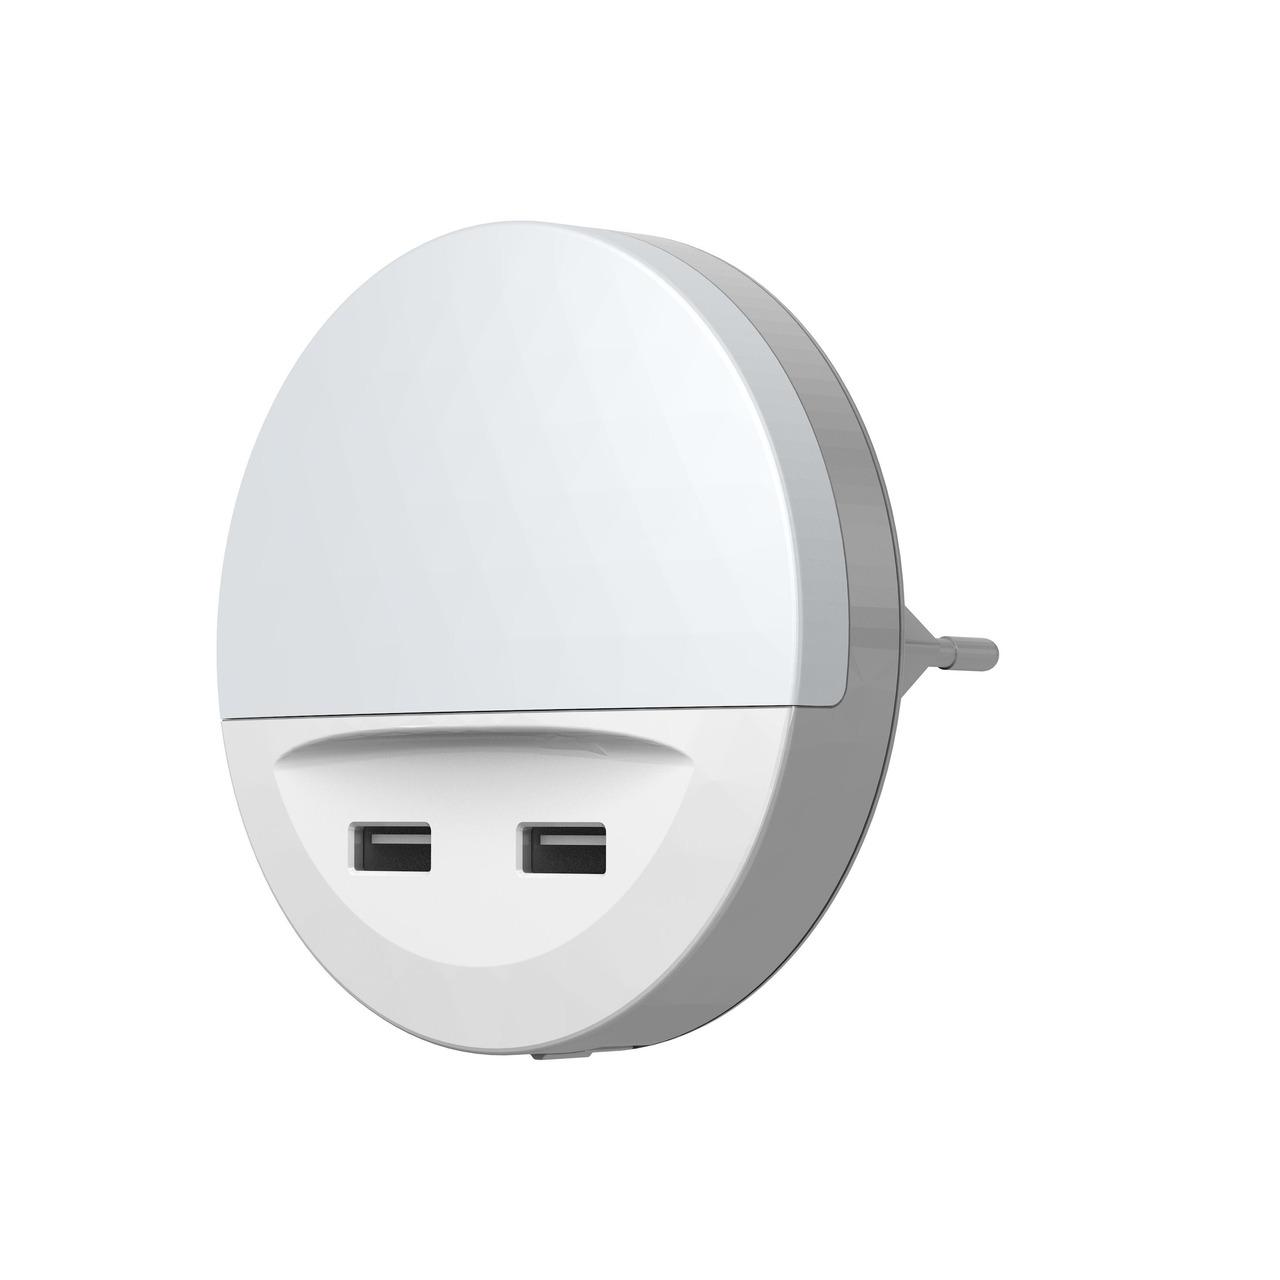 Ledvance Sockel-Nachtlicht LUNETTA USB- mit USB-Ausgund-228 ngen- Tag-Nachtsensor- IP20